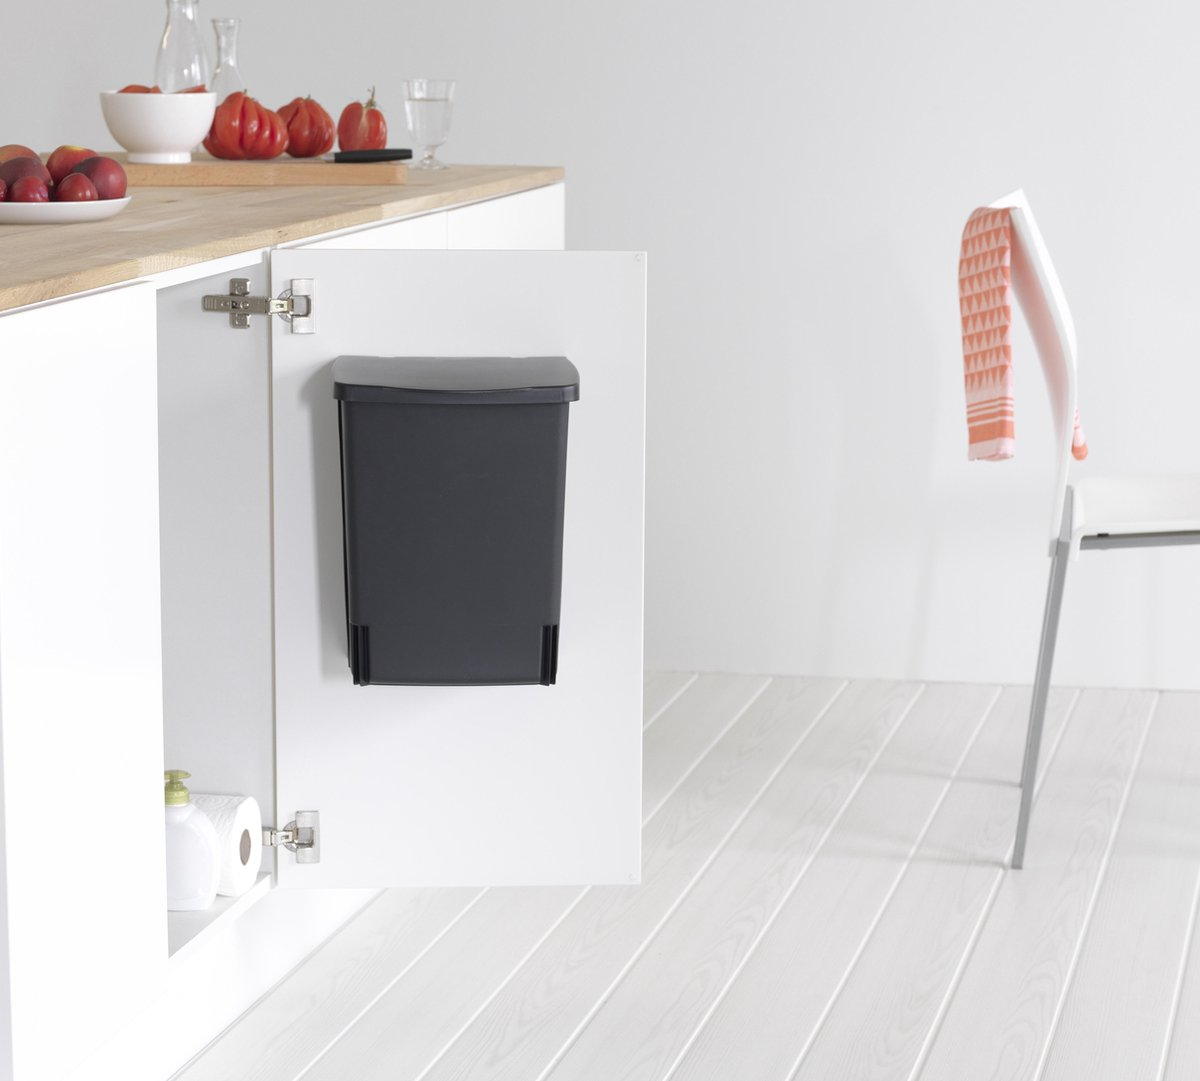 Okoli Ostanki Zaupno Inbouw Vuilnisbak Ikea M Style Aroma Com